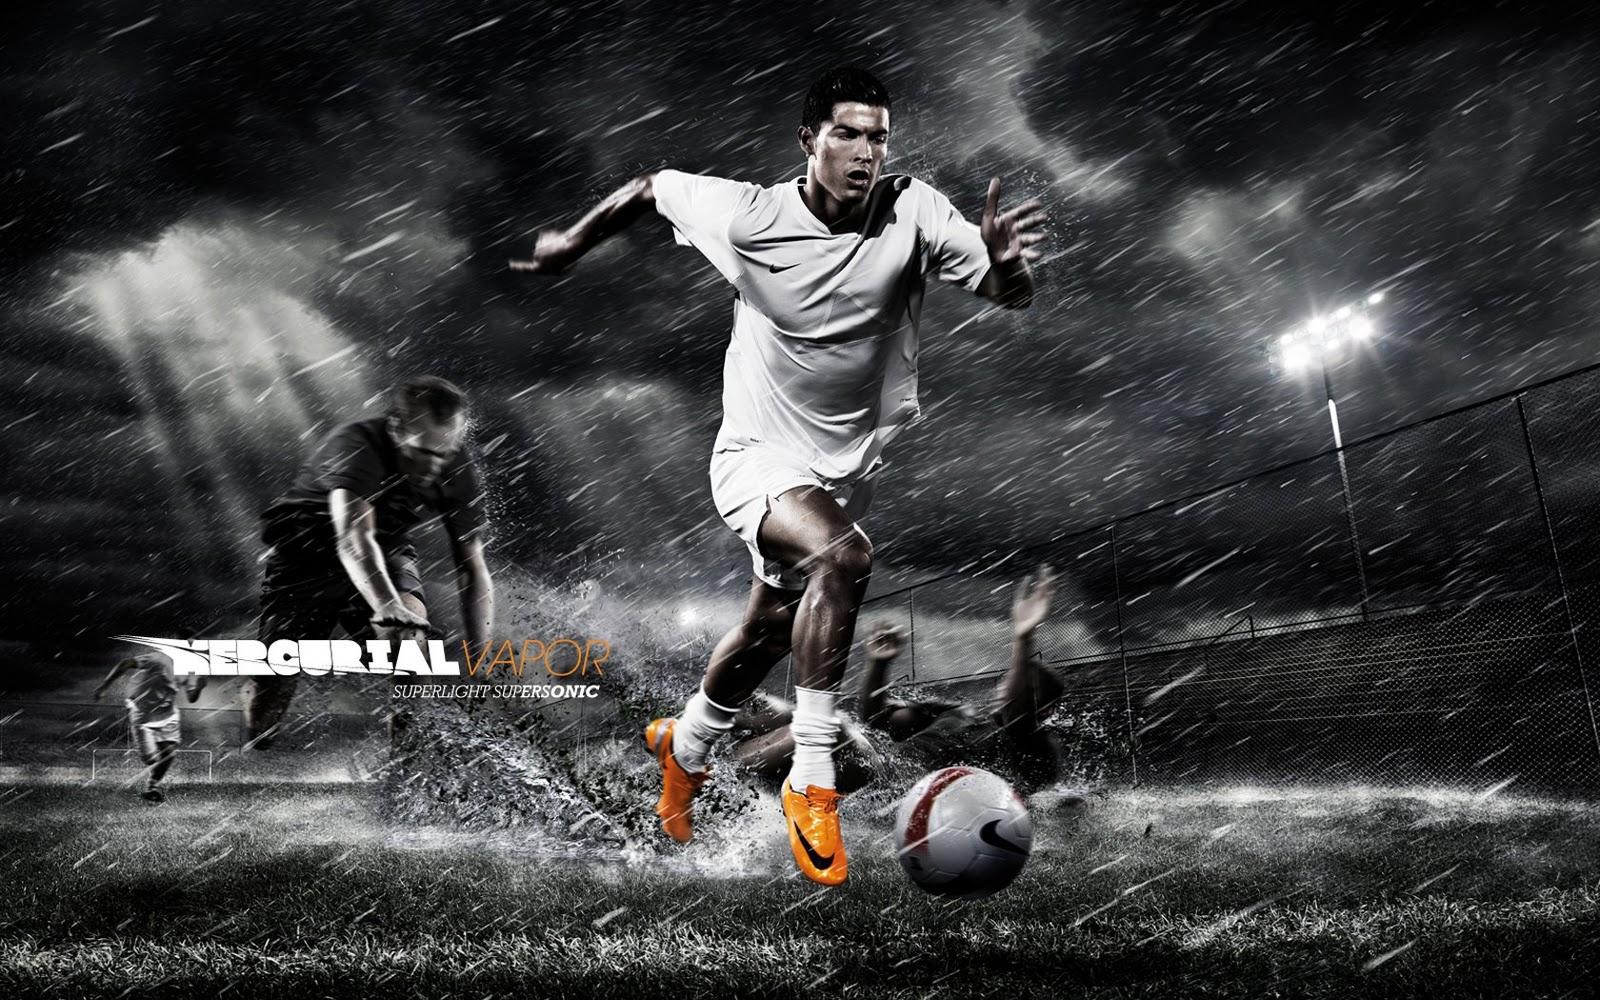 Sport Wallpaper Awesome: WongSeng HD Wallpapers: Awesome Sport Wallpaper